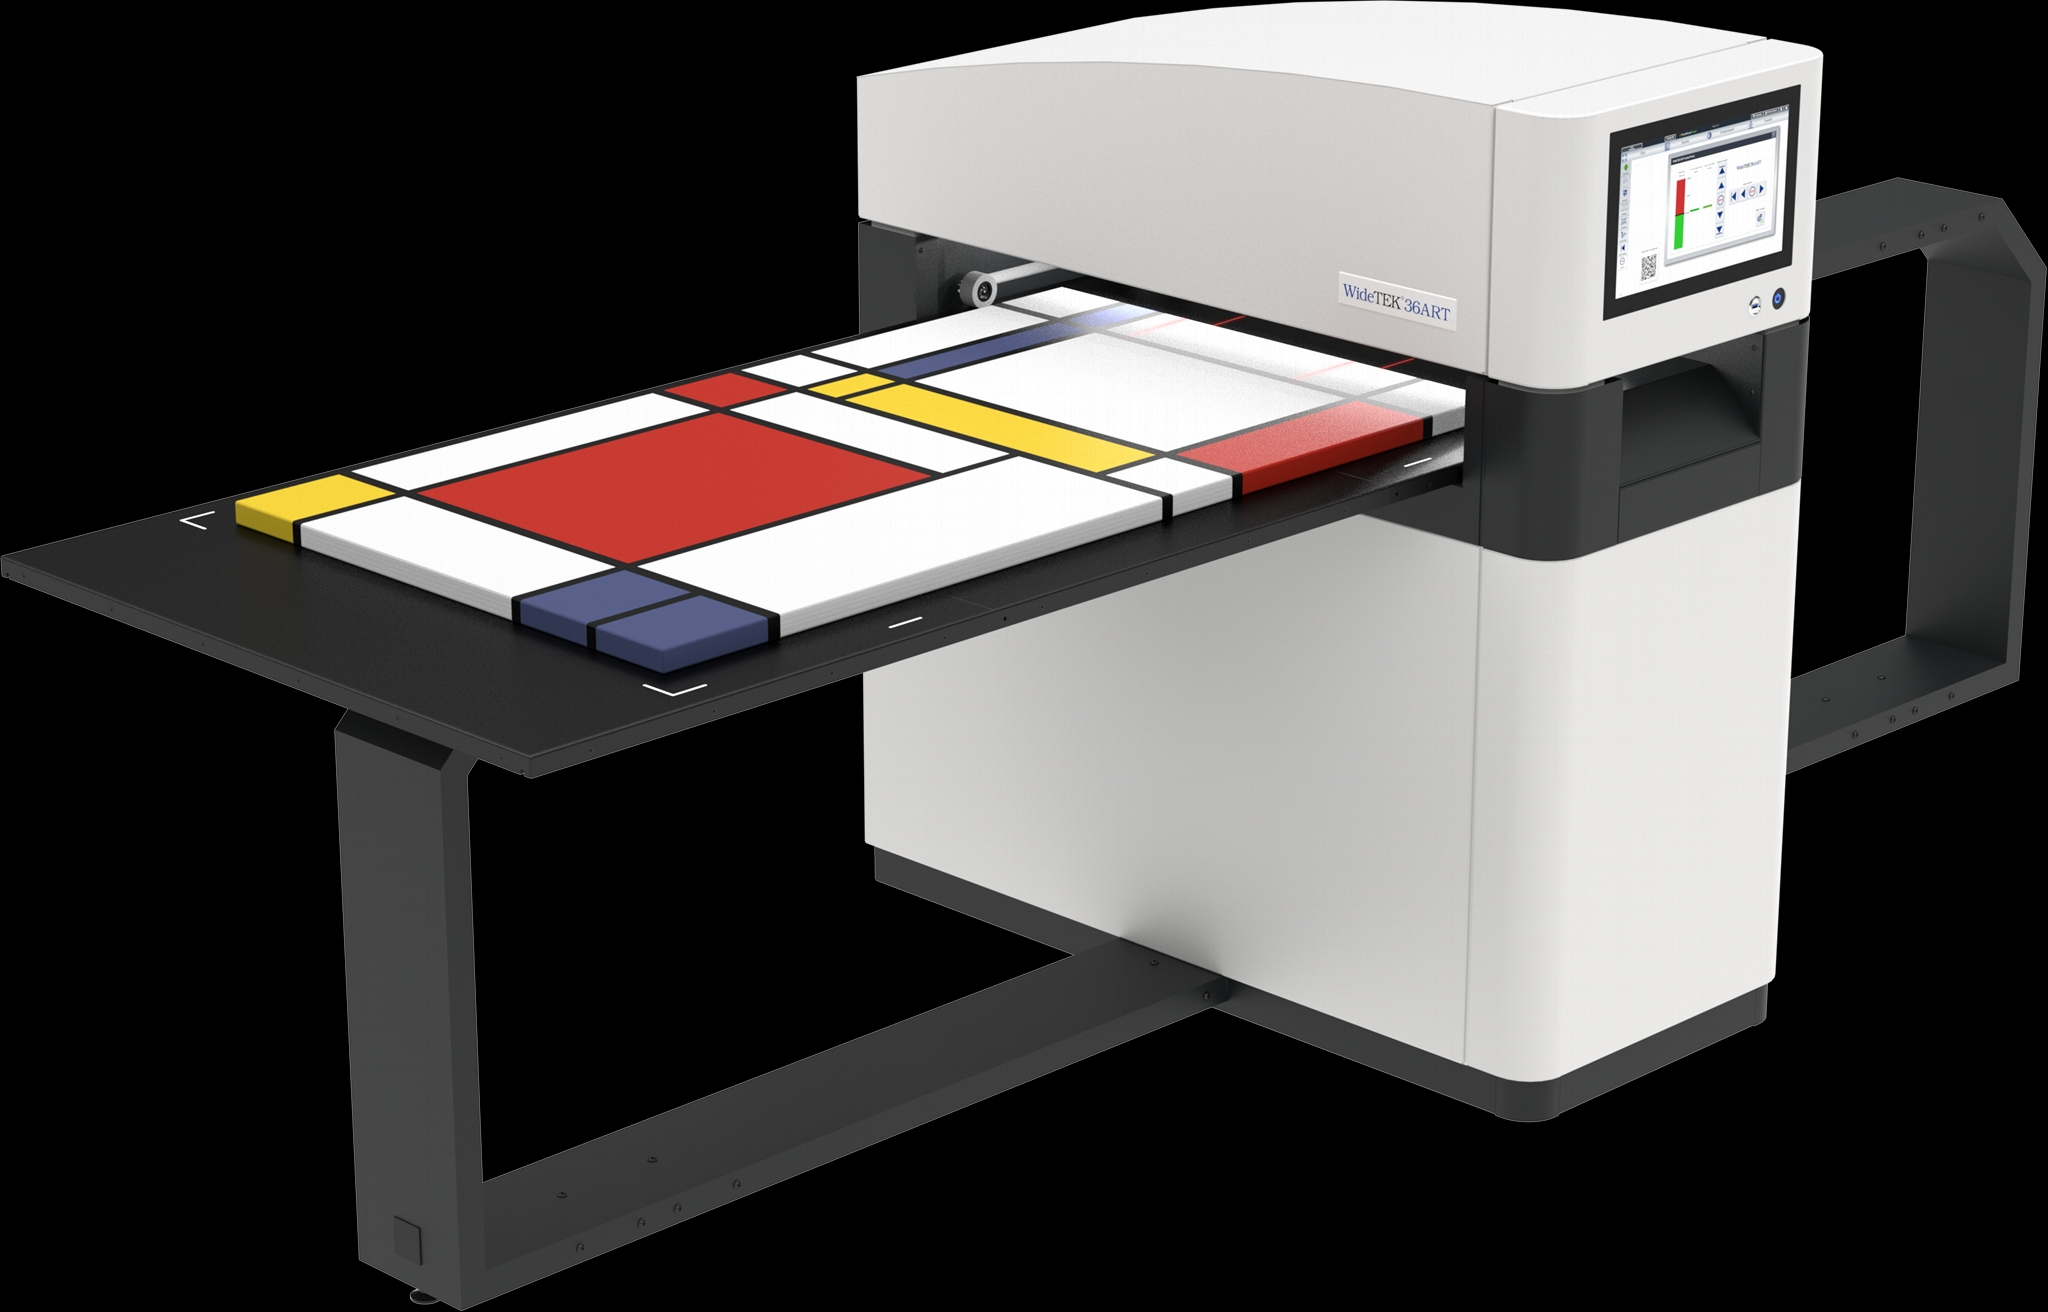 WideTEK 36 ART 艺术品书画扫描仪 1